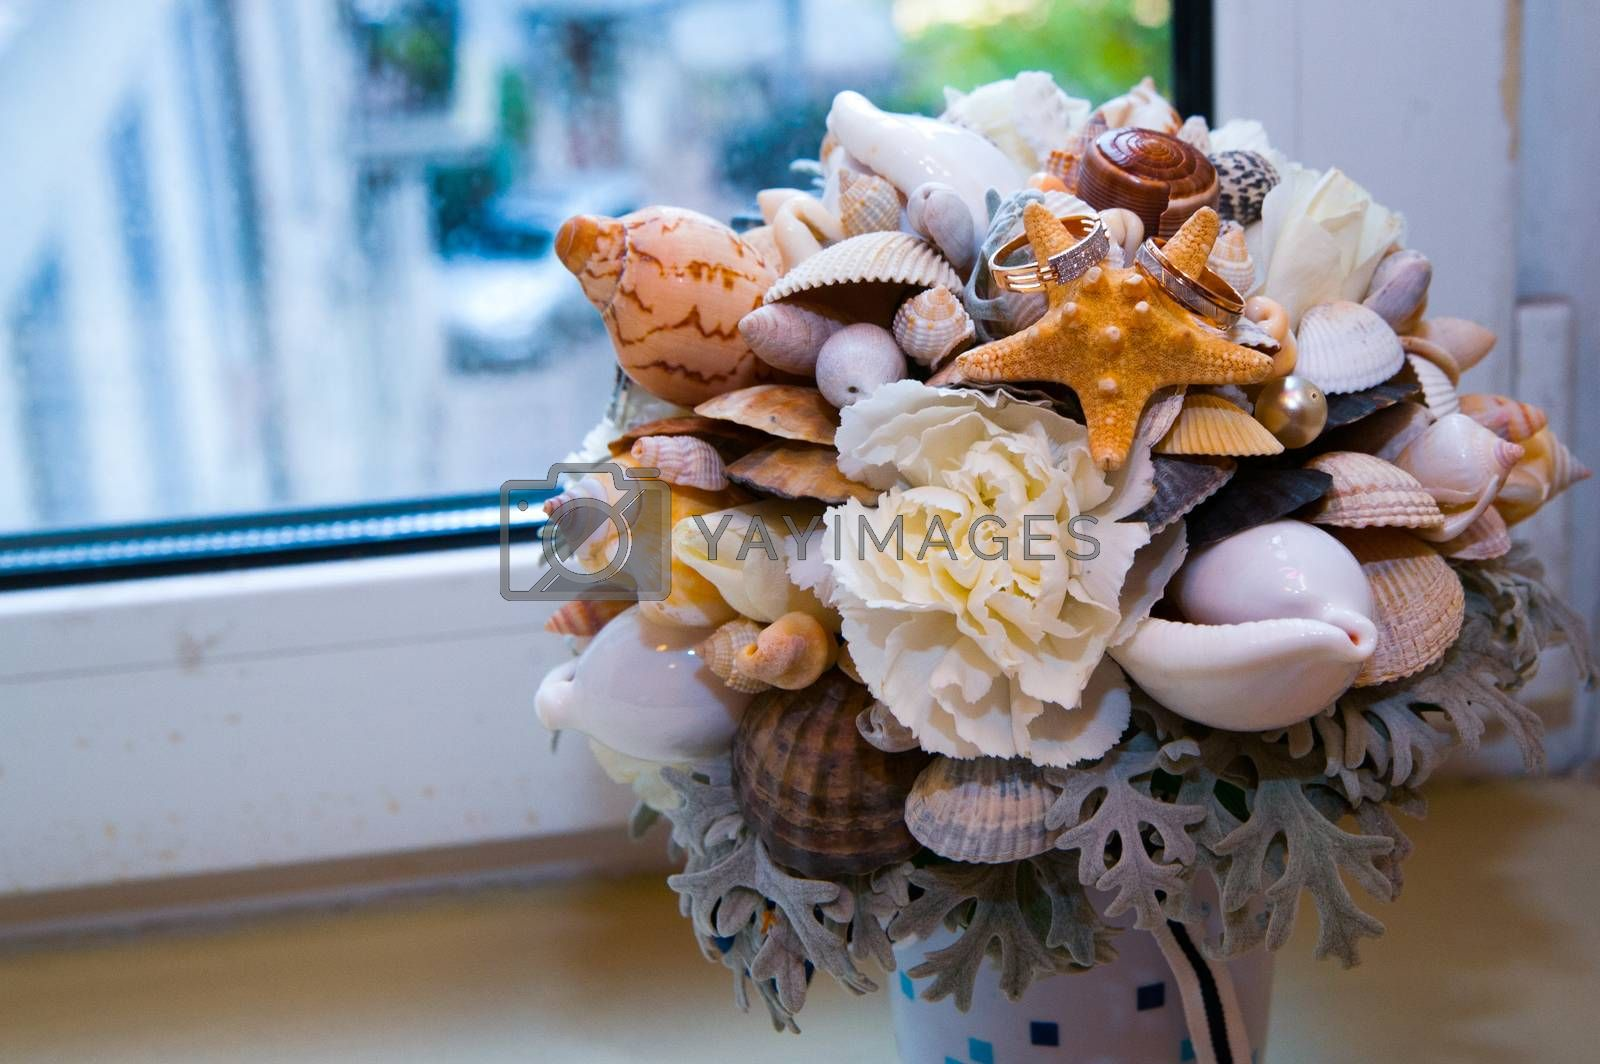 Beautiful gold jewelry lying around flowers in the wedding day